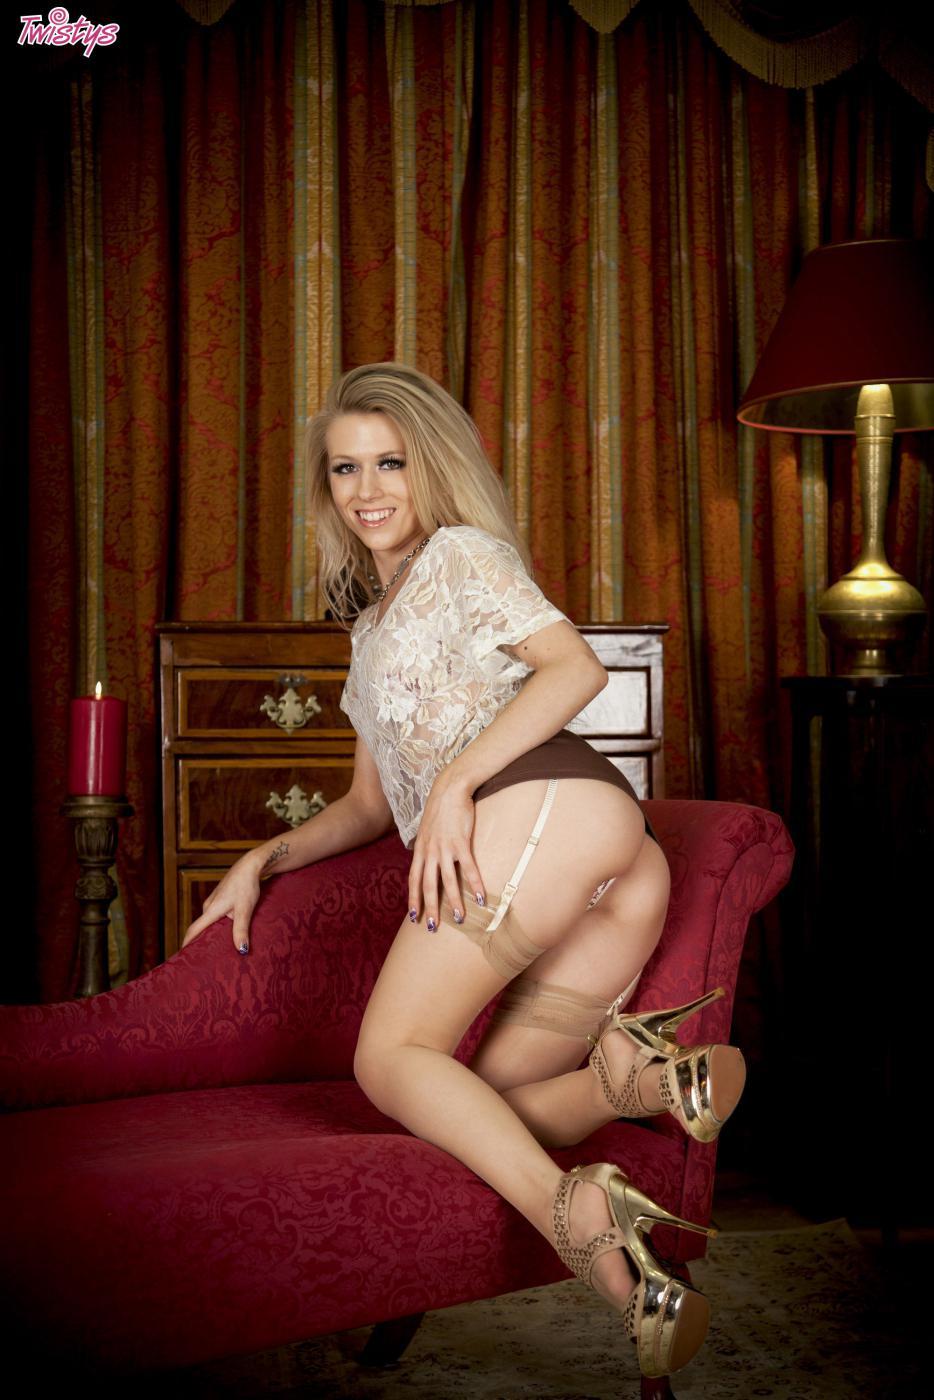 Светлая порно звезда Michelle Moist снимает нижнее белье до чулок и шалит с собой